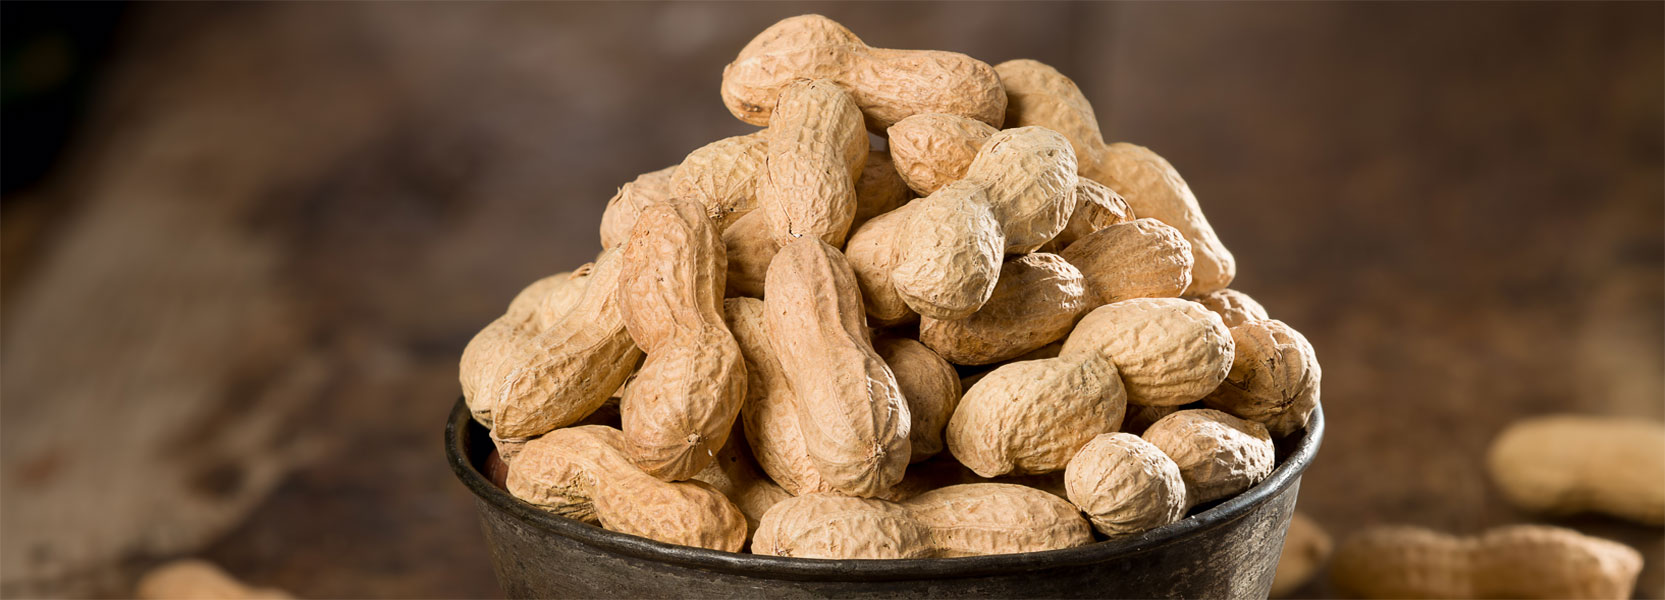 banner-bowlpeanuts